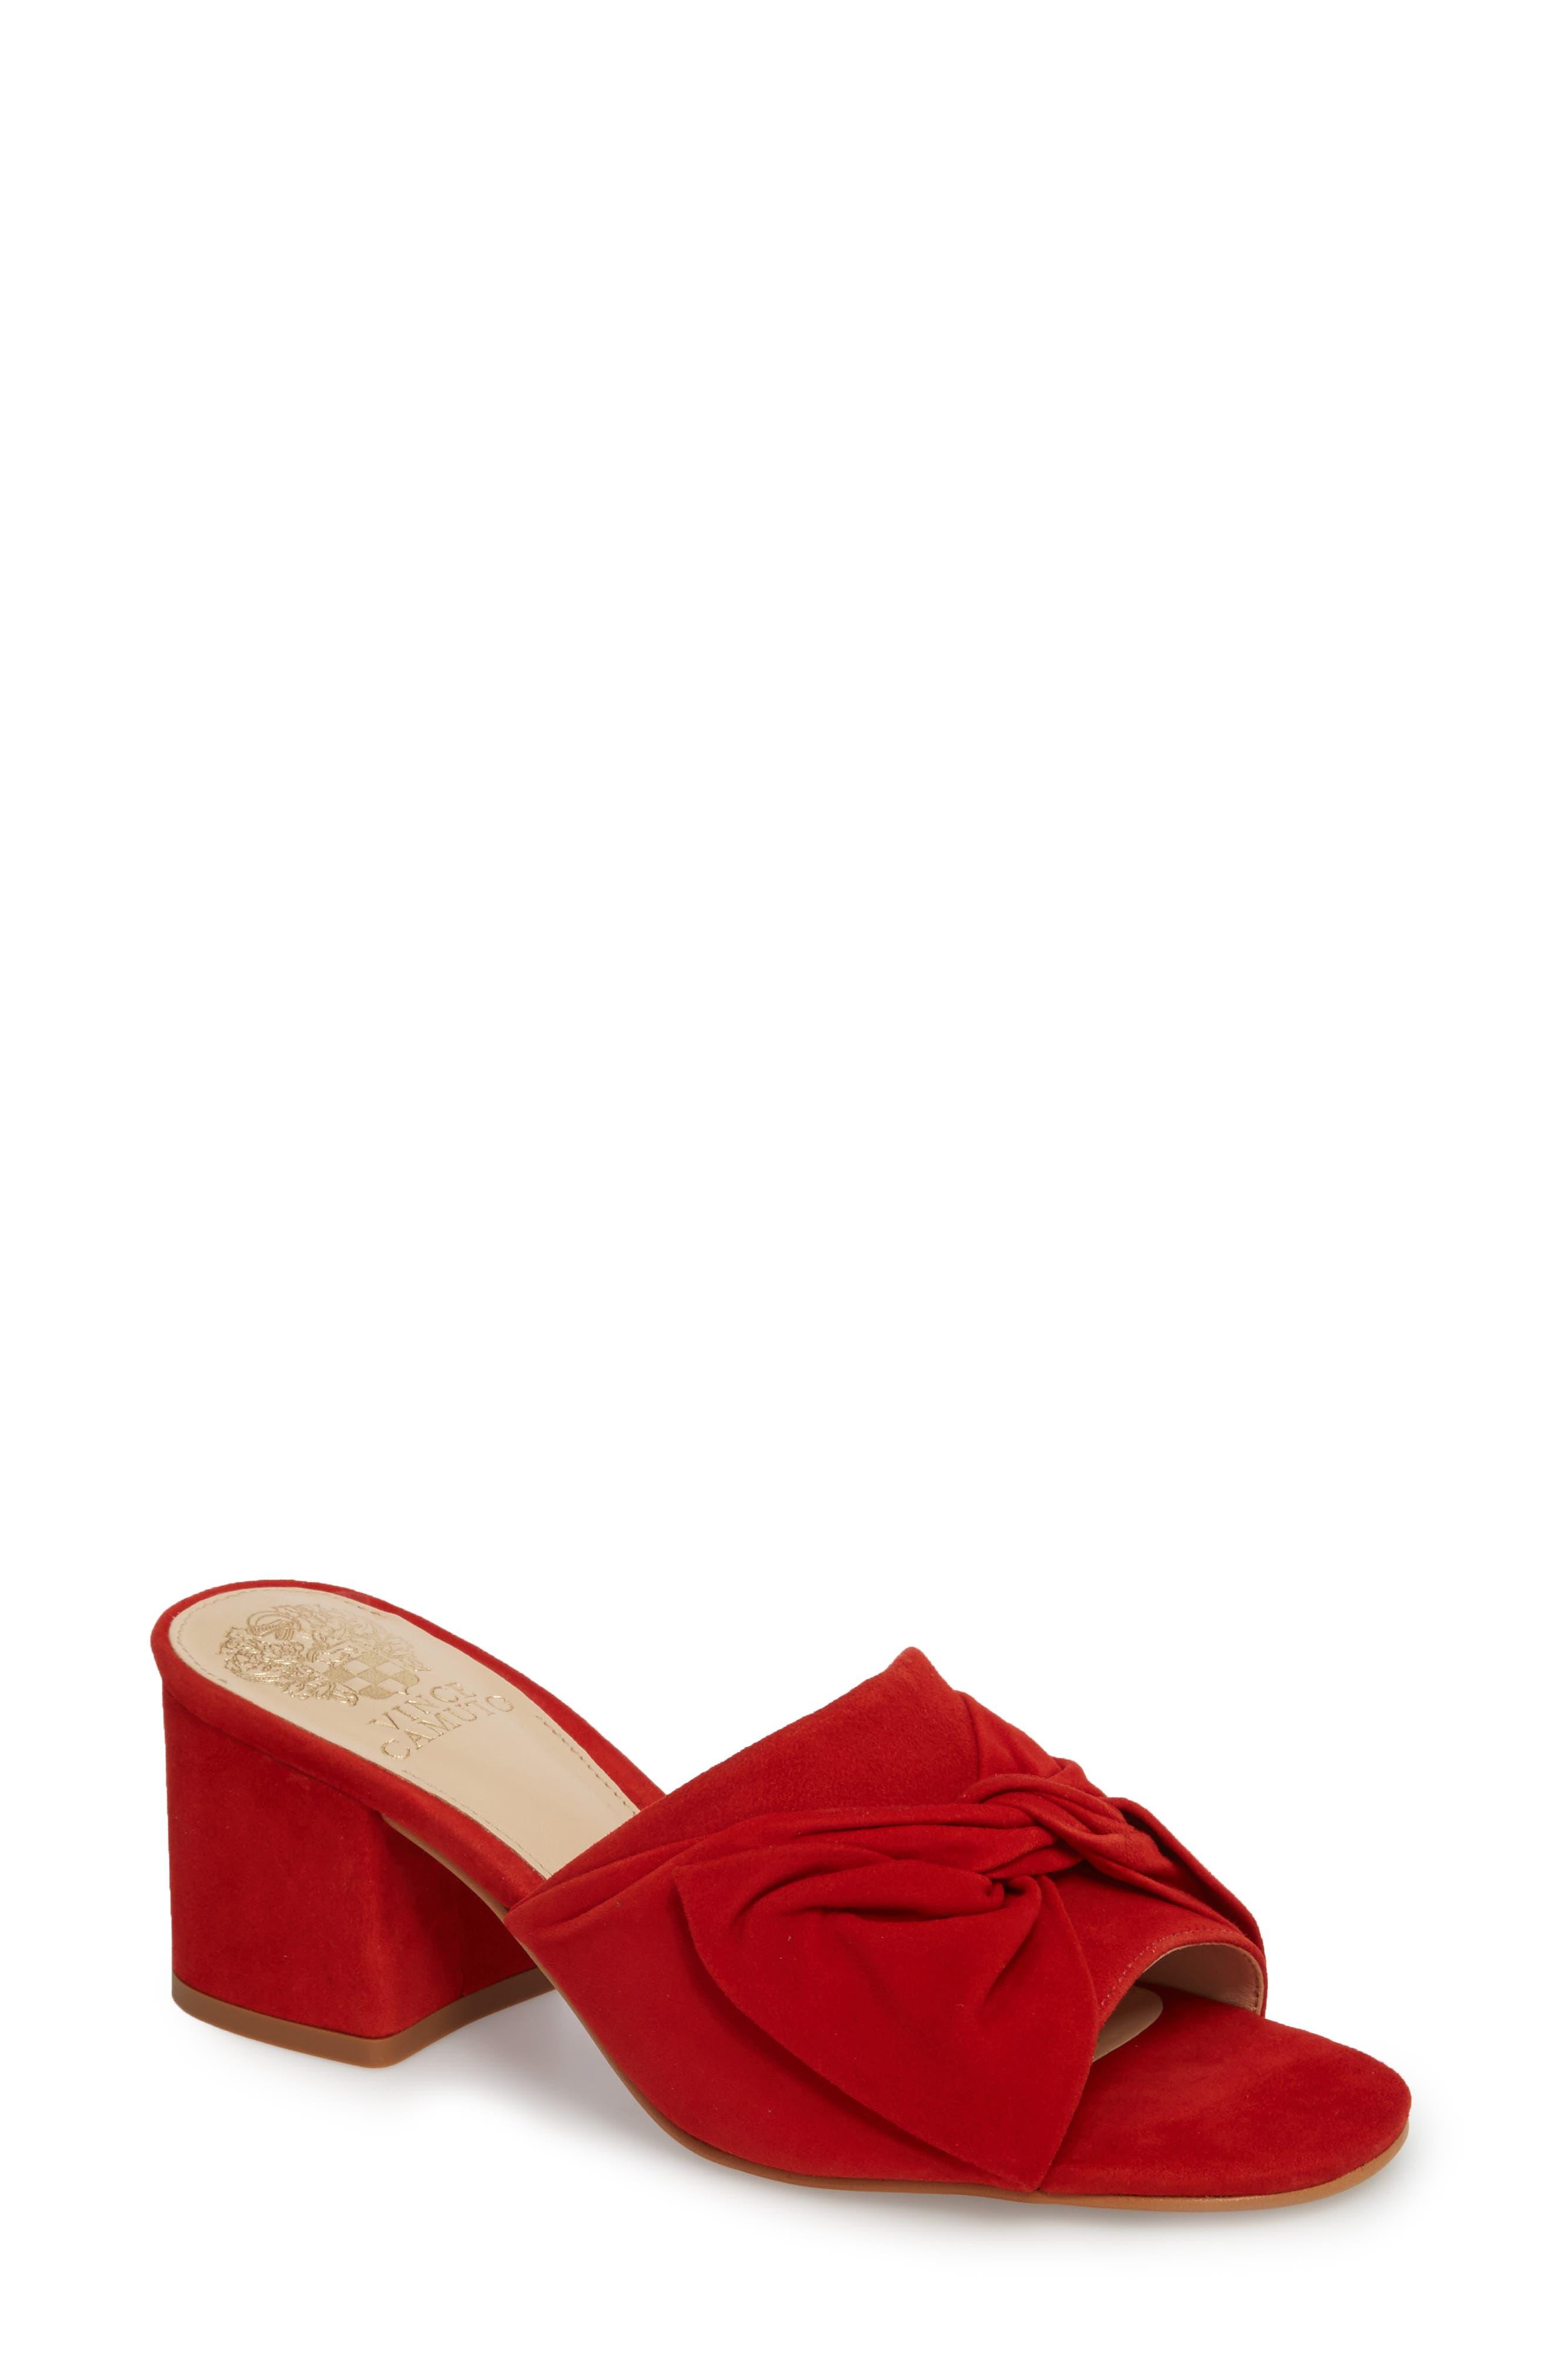 Sharrey Sandal,                             Main thumbnail 1, color,                             Red Hot Rio Suede